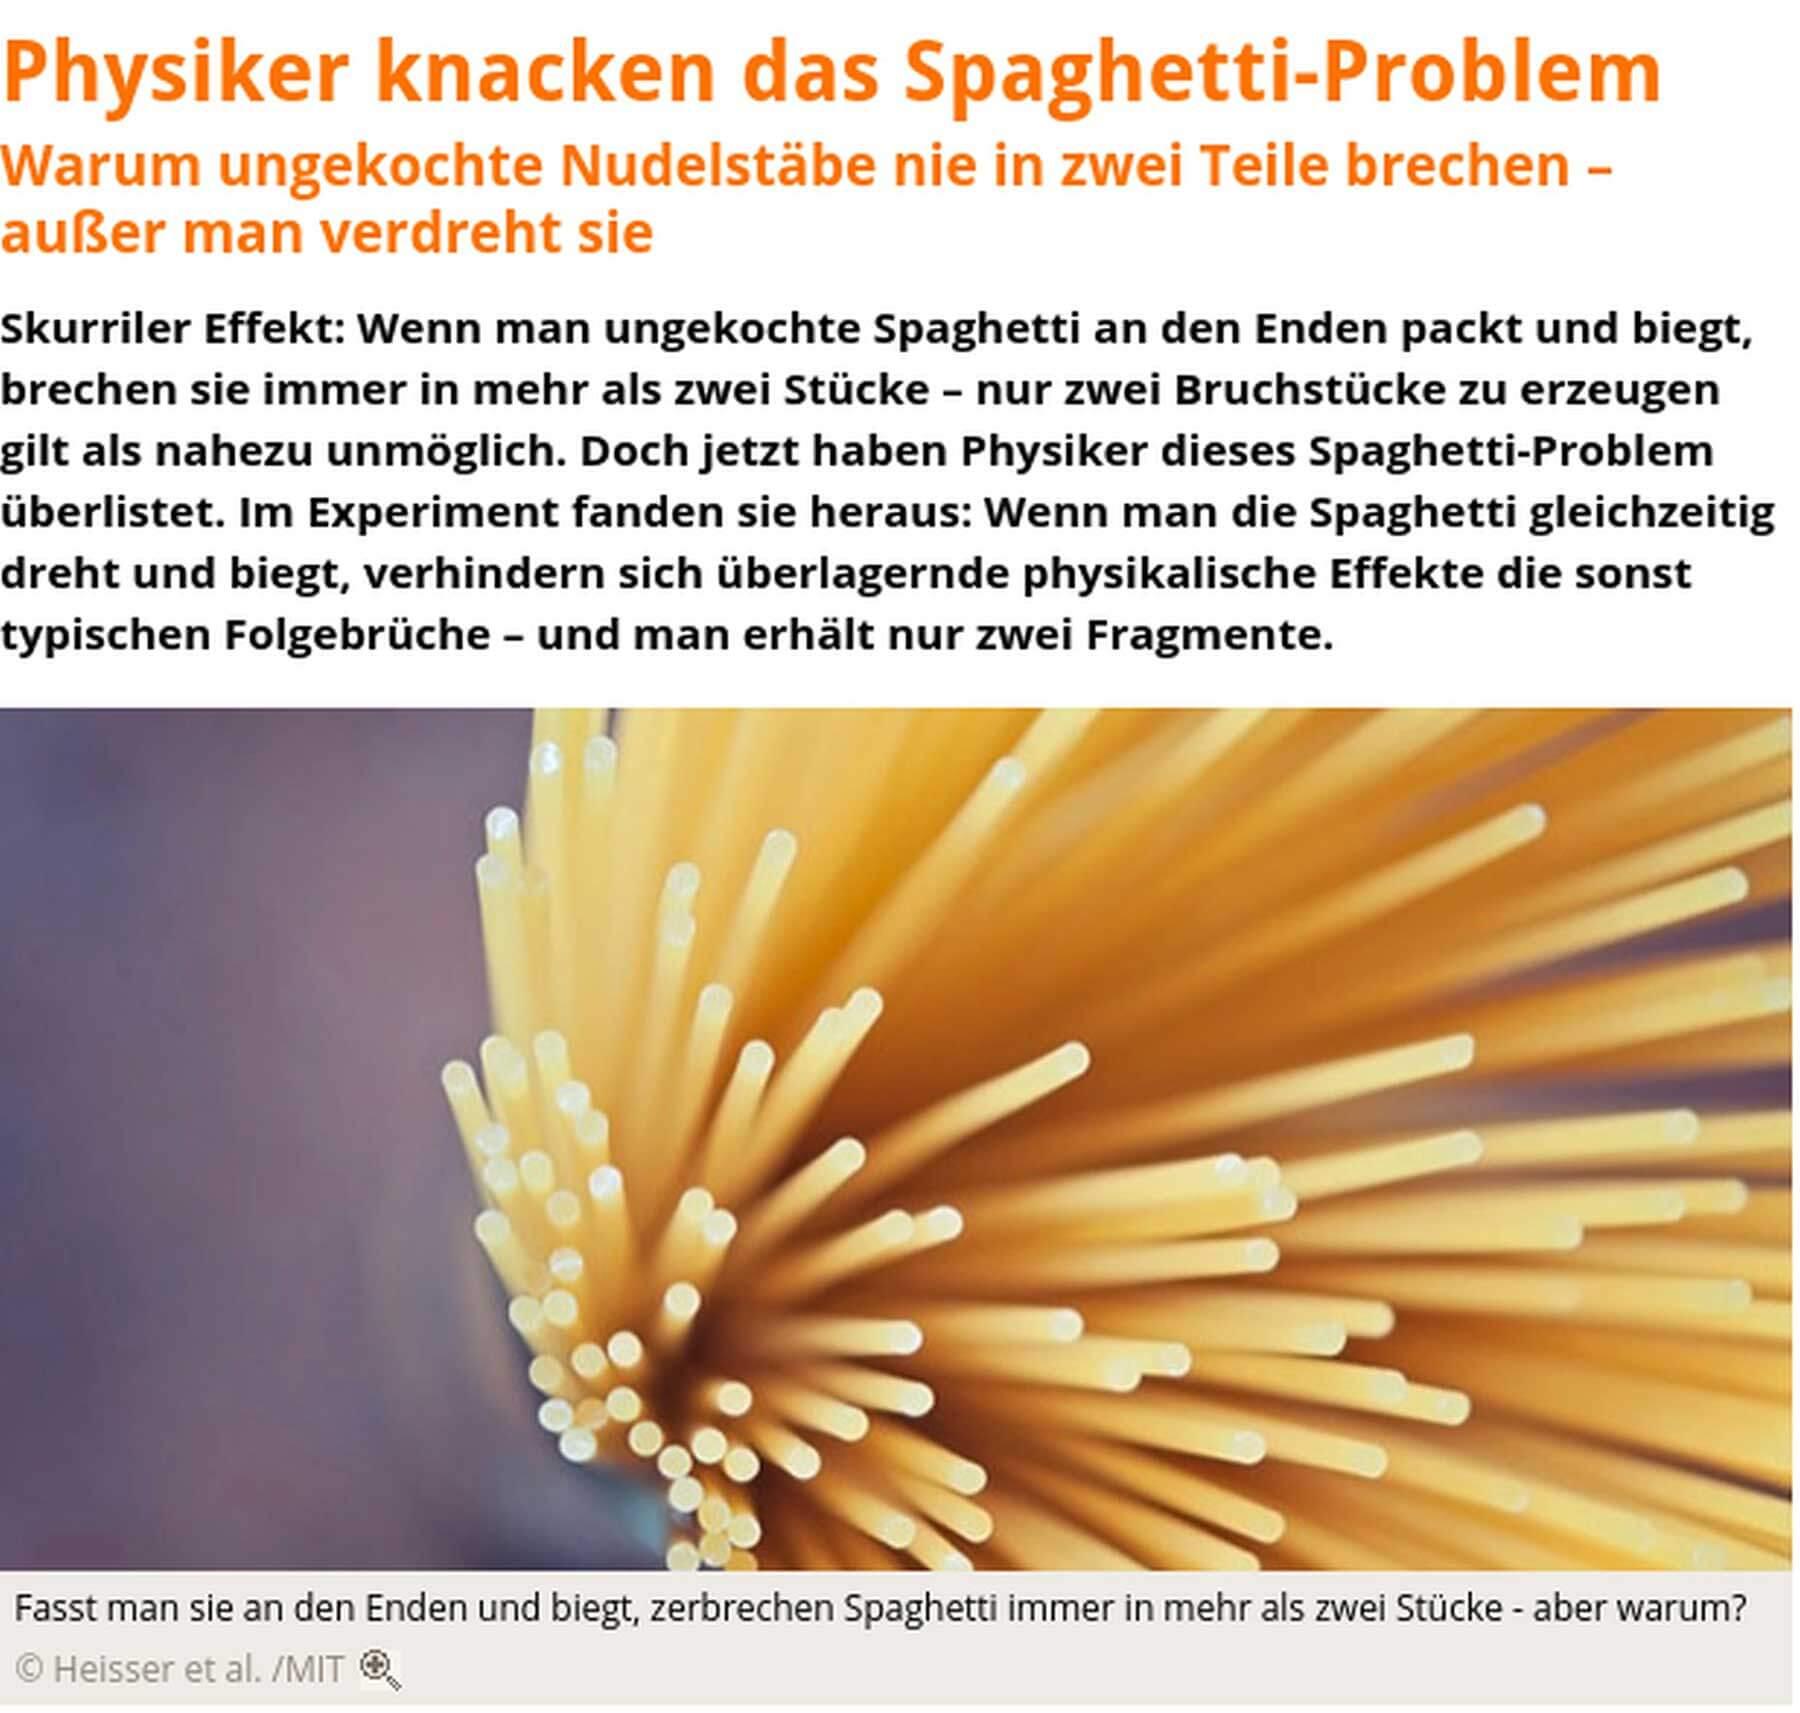 Bilderparade DXII LangweileDich.net_Bilderparade_DXII_85